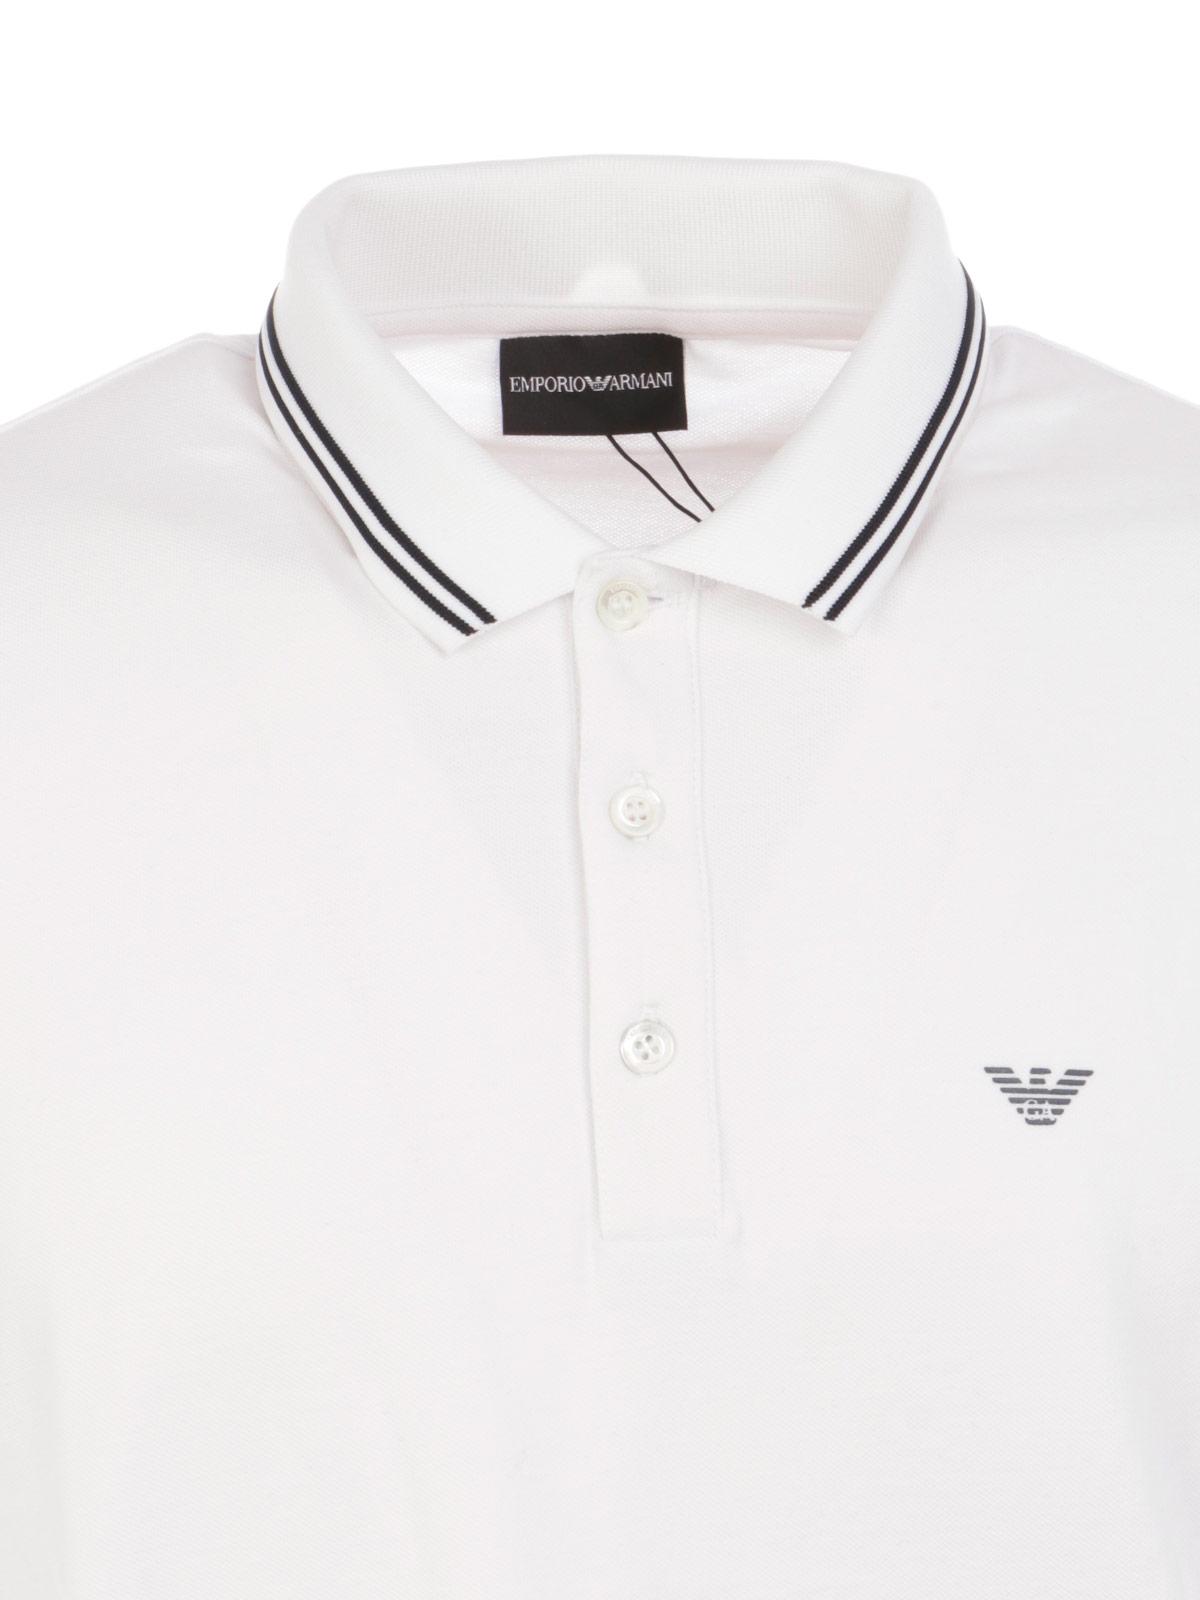 Picture of EMPORIO ARMANI   Men's Cotton Polo Shirt